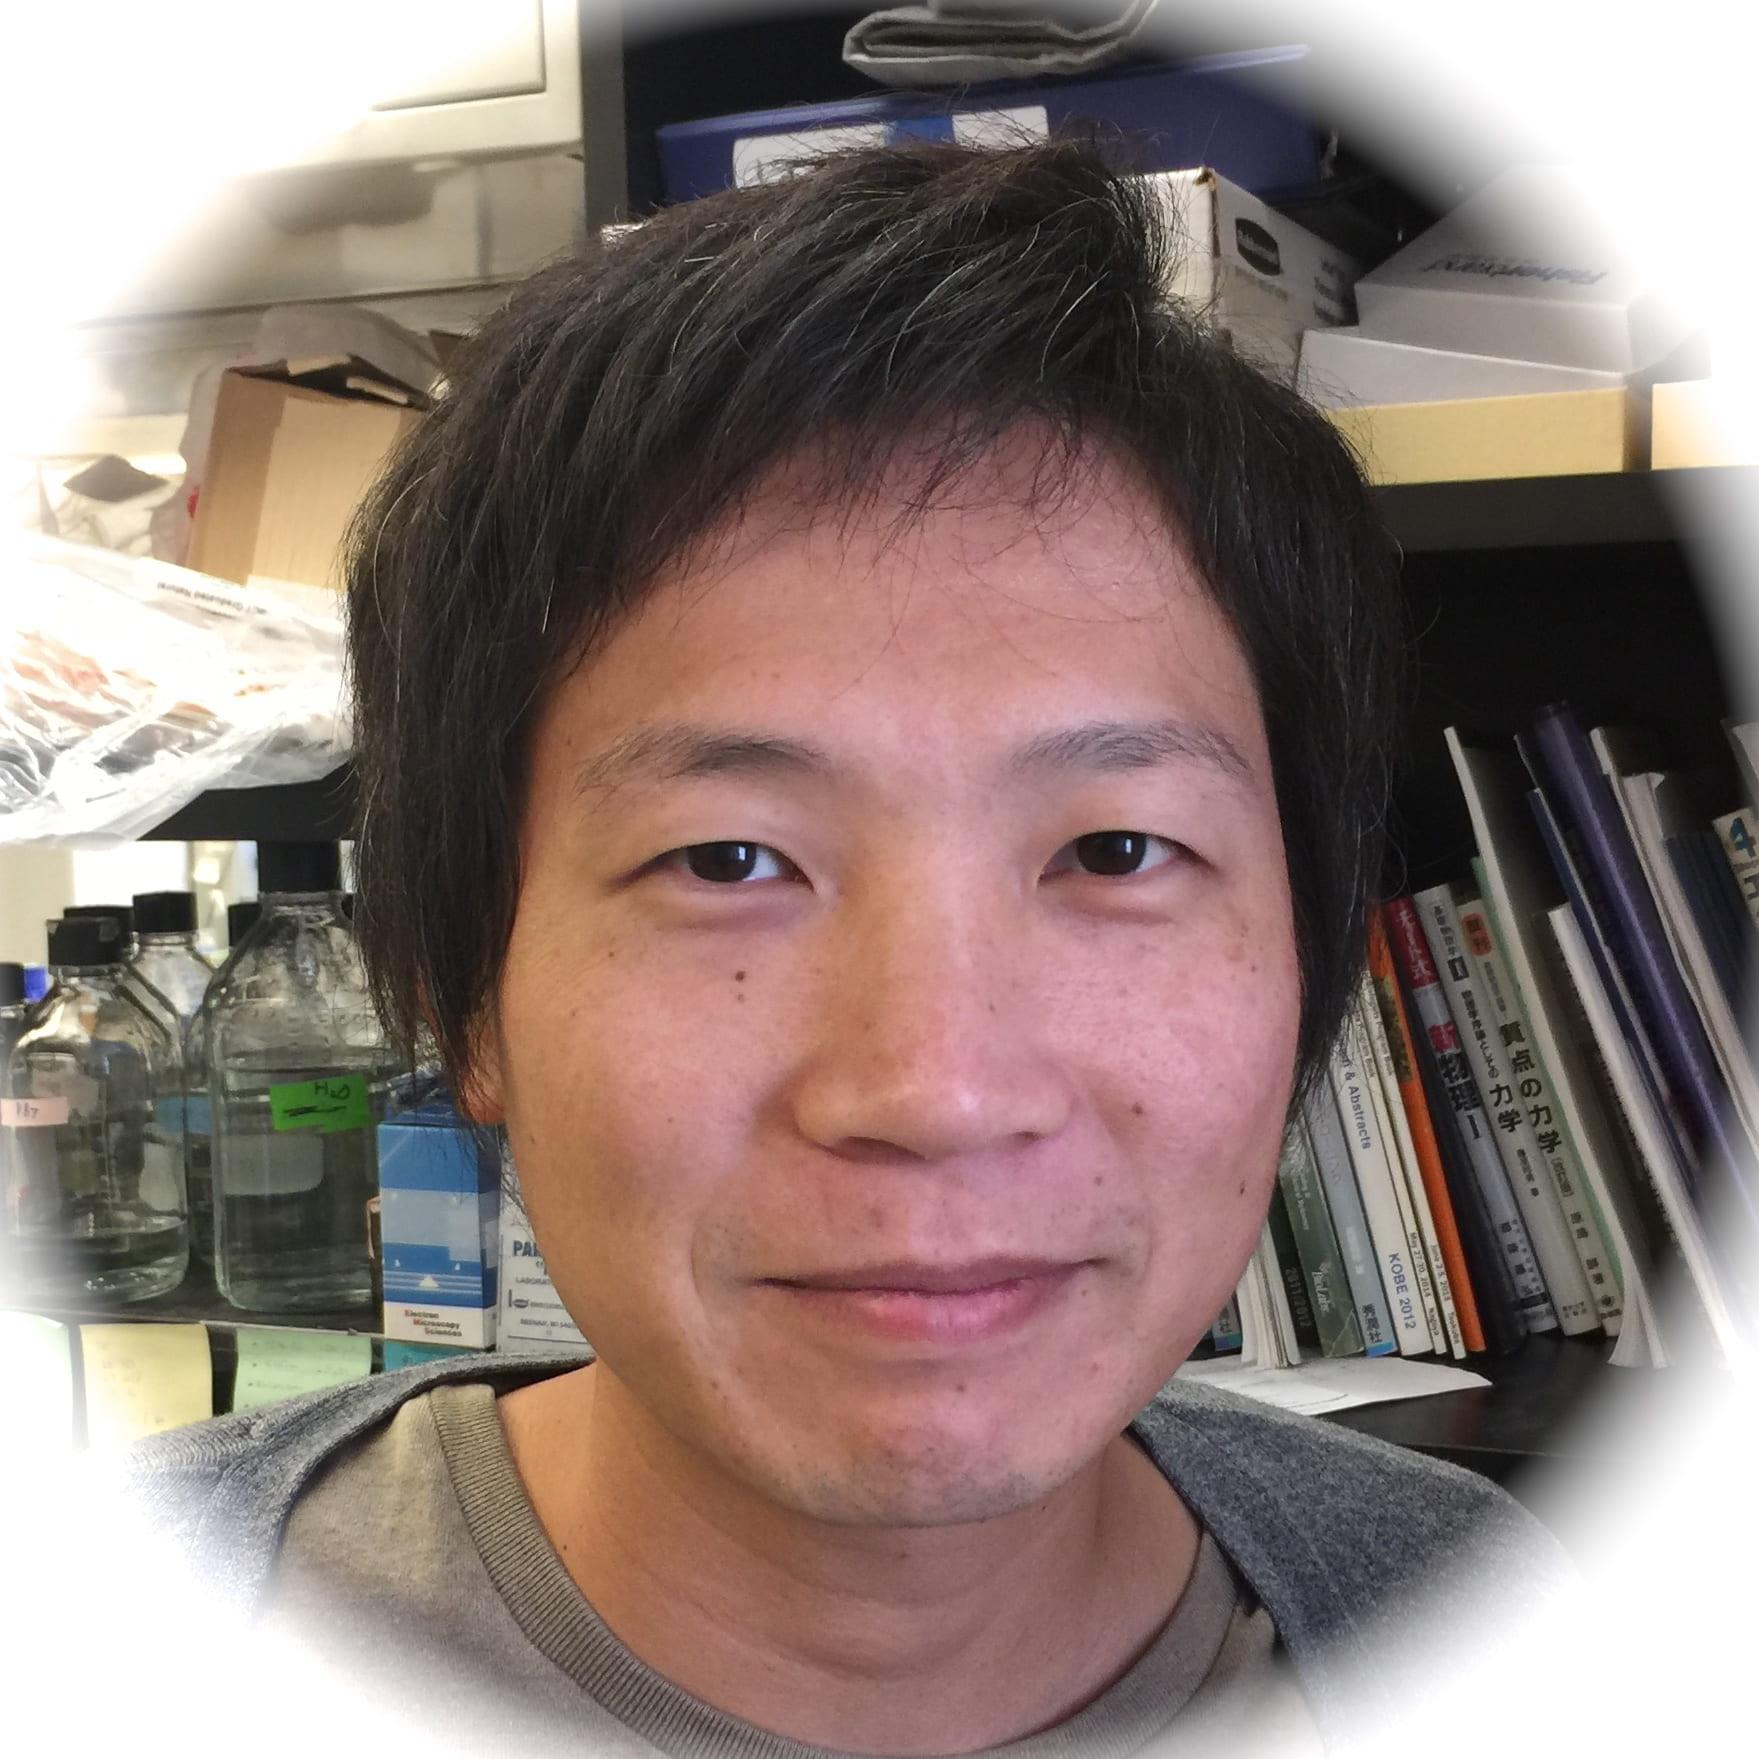 Hidehiko Hashimoto